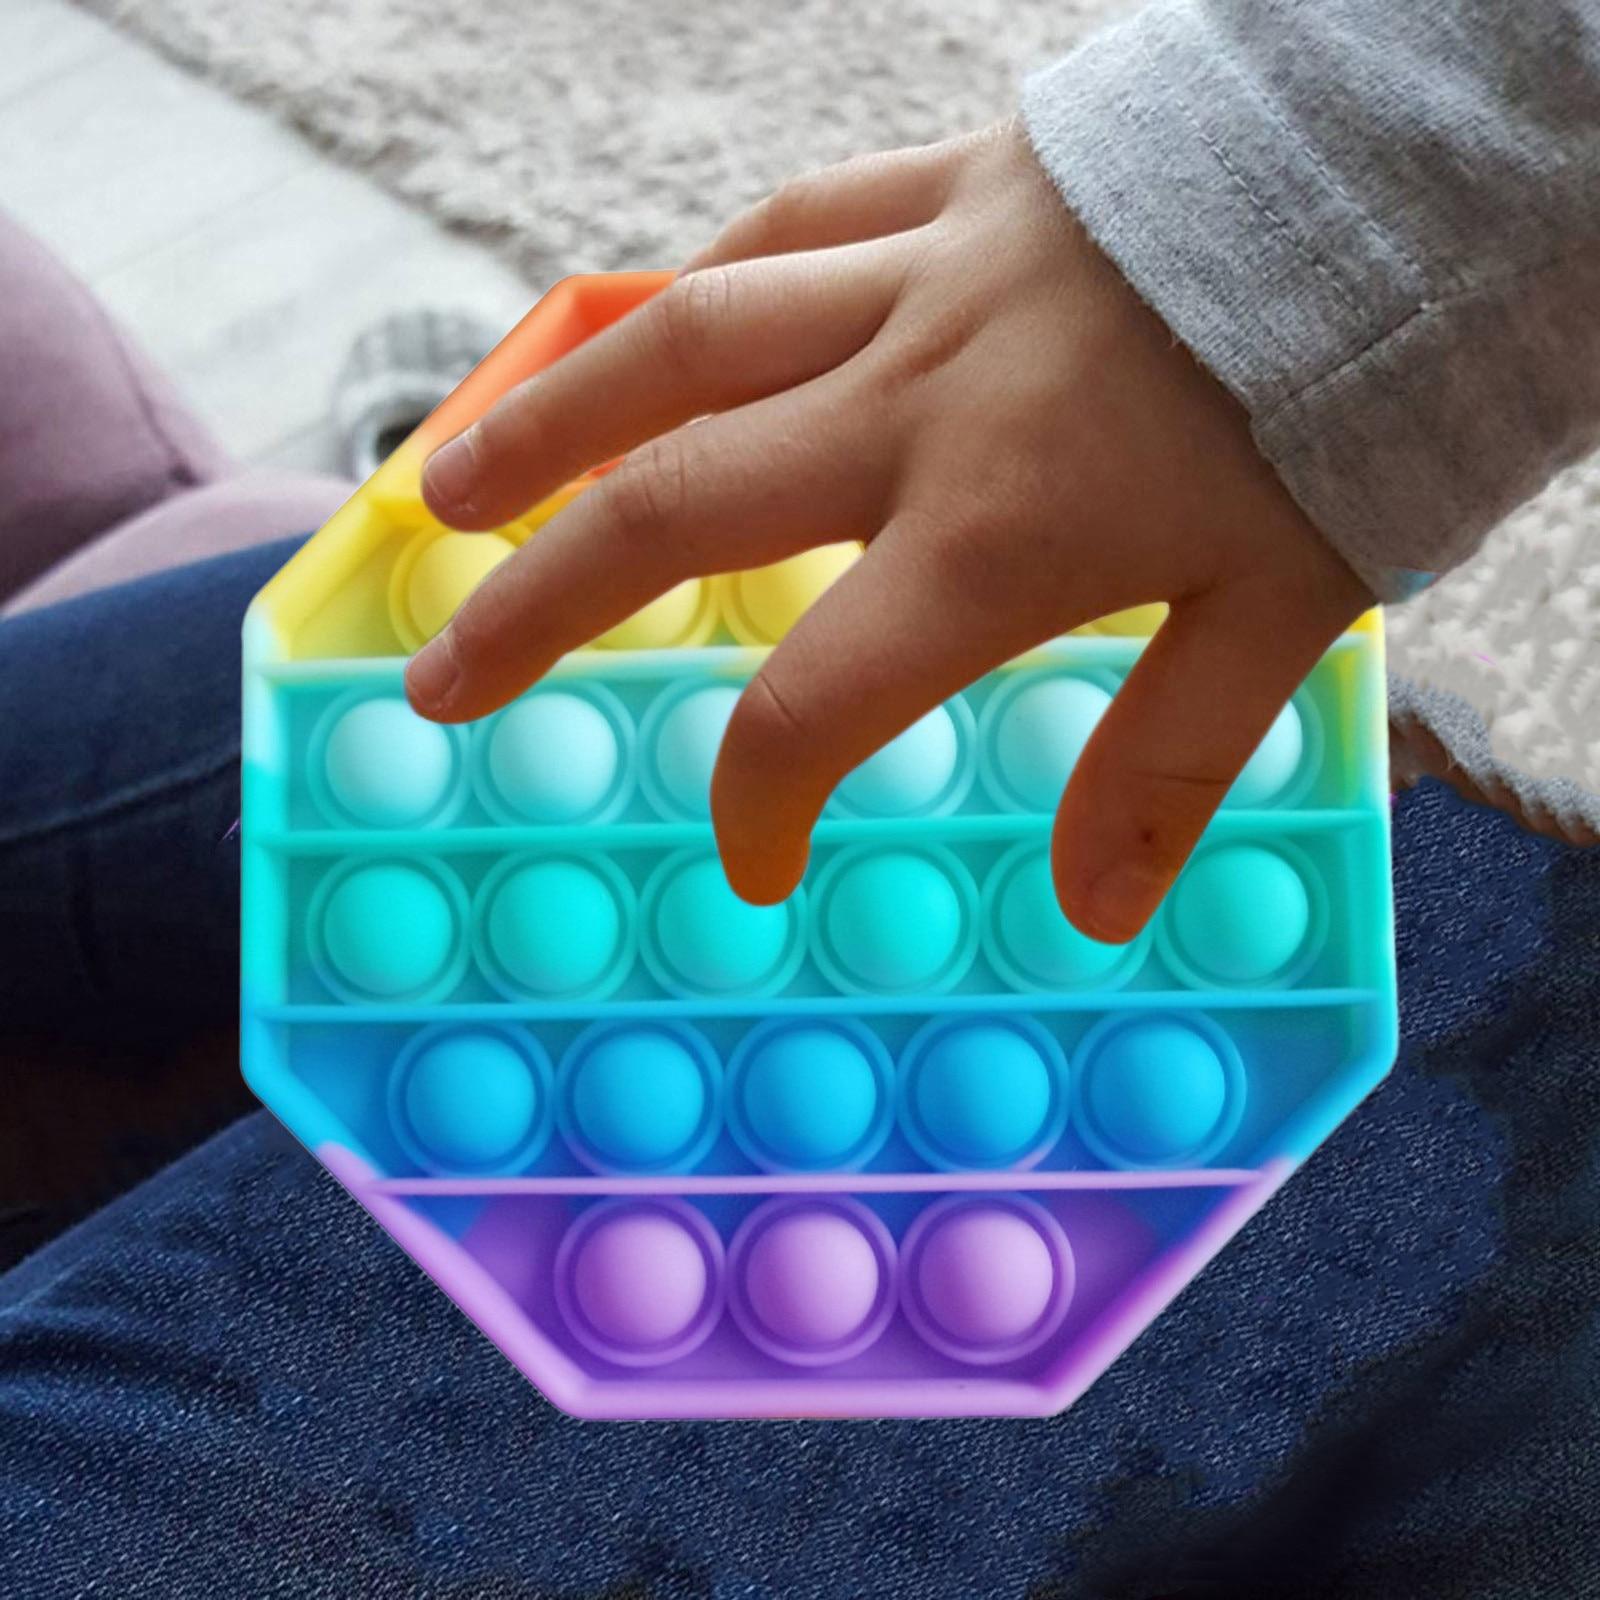 Stress-Toys Fidget Funny Gift Push Bubble Pops Reliever Special Children 1pc Autism Juguetes img2